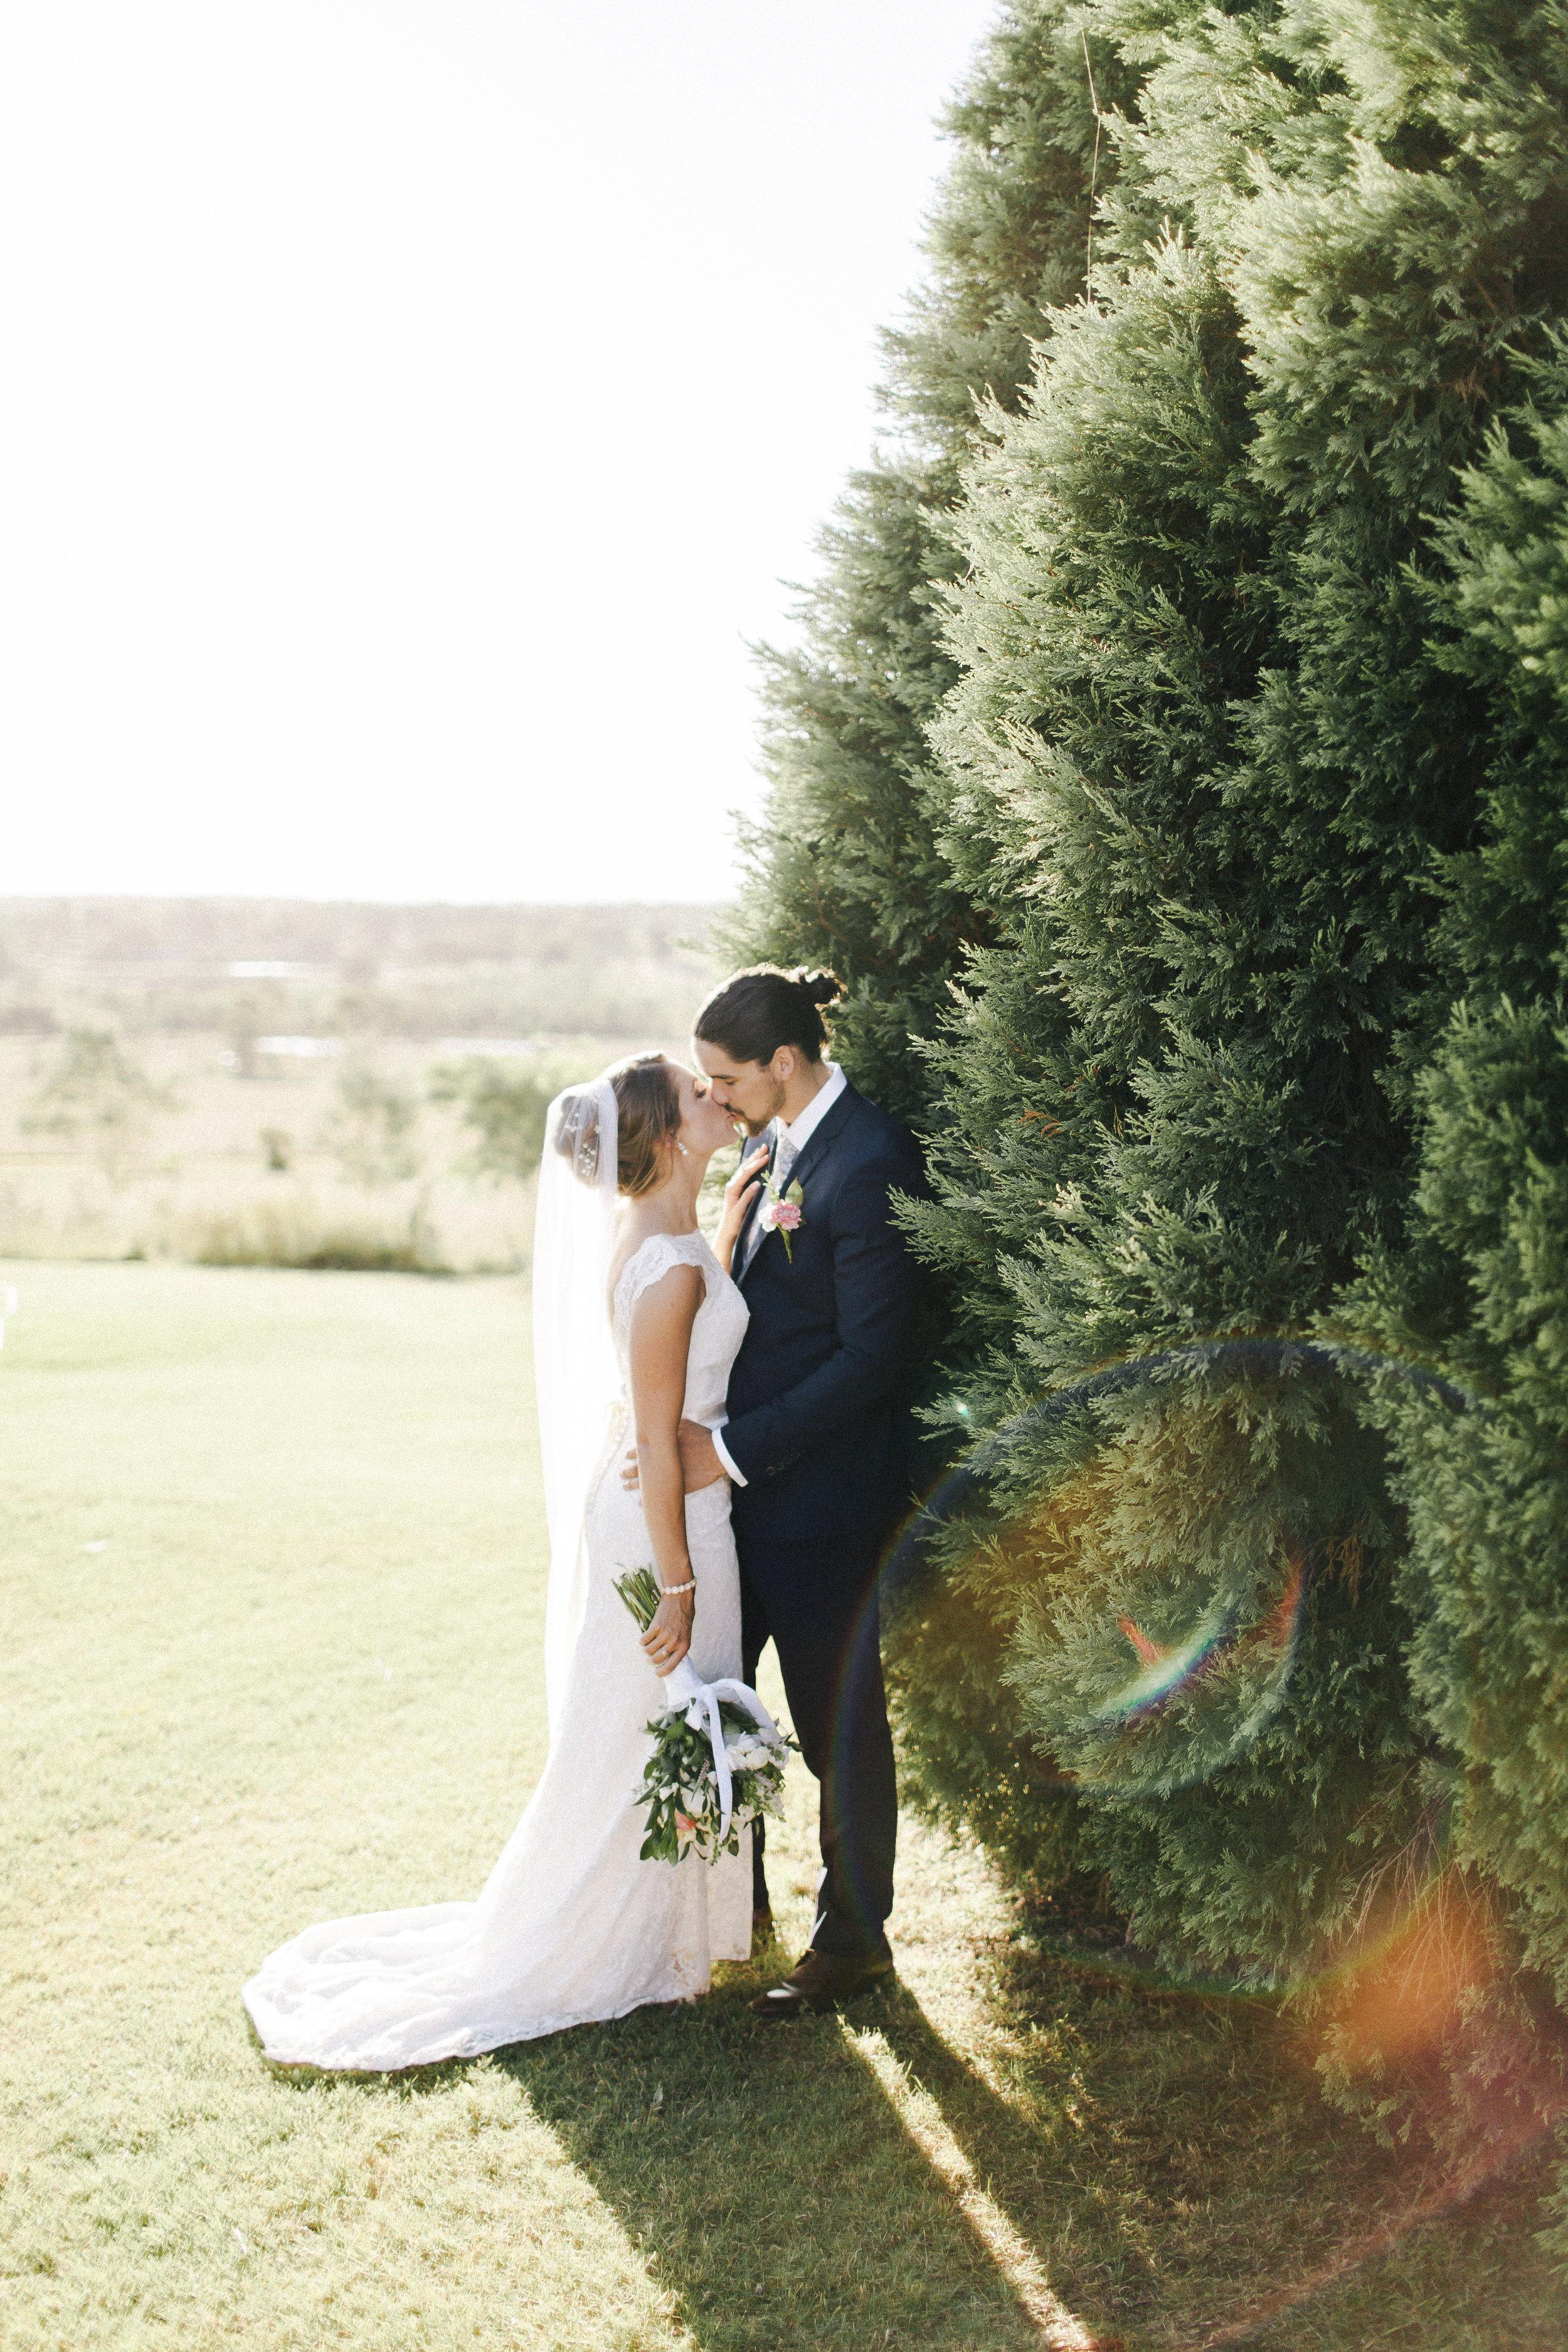 WeddingPhotos_HighResolution-1433-2.jpg